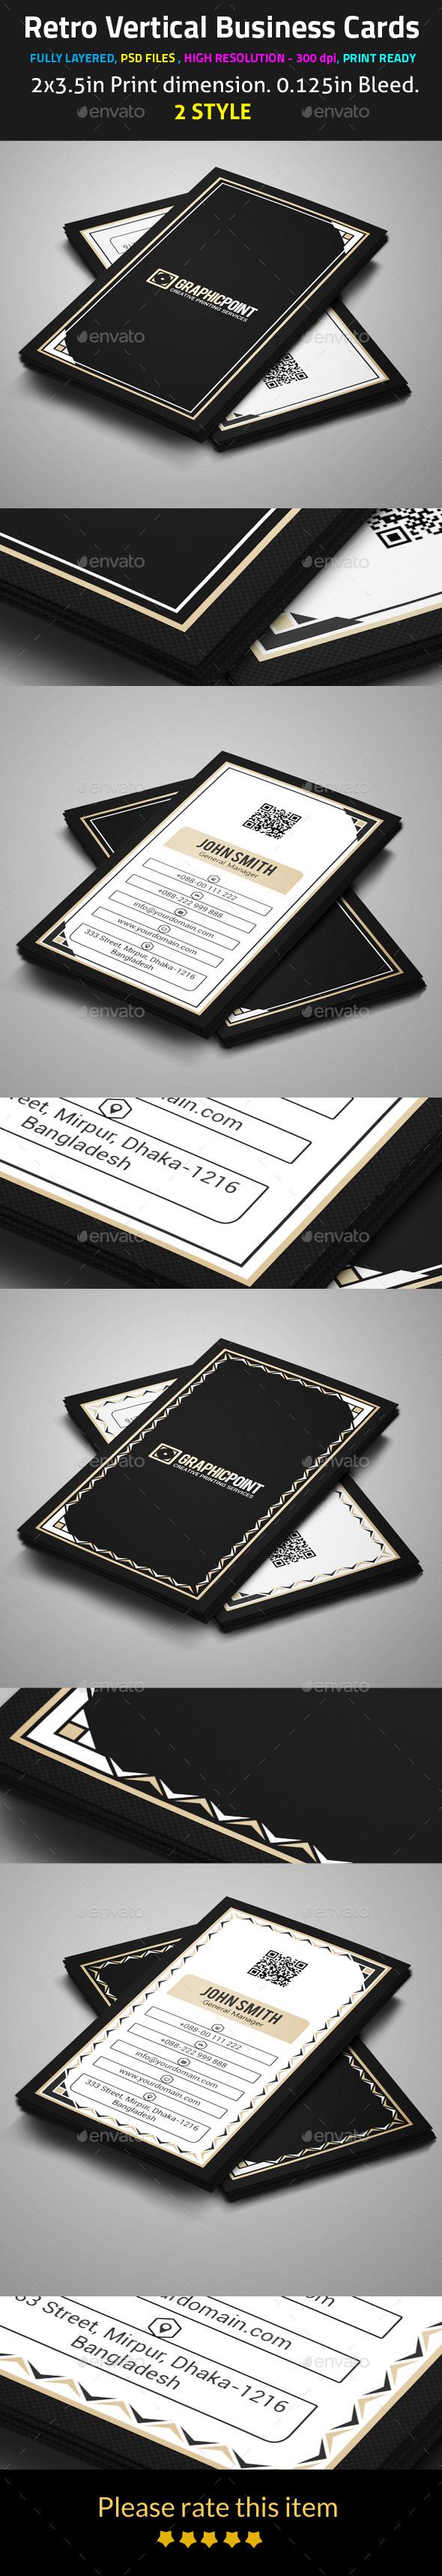 Retro Vertical Business Cards - Retro/Vintage Business Cards